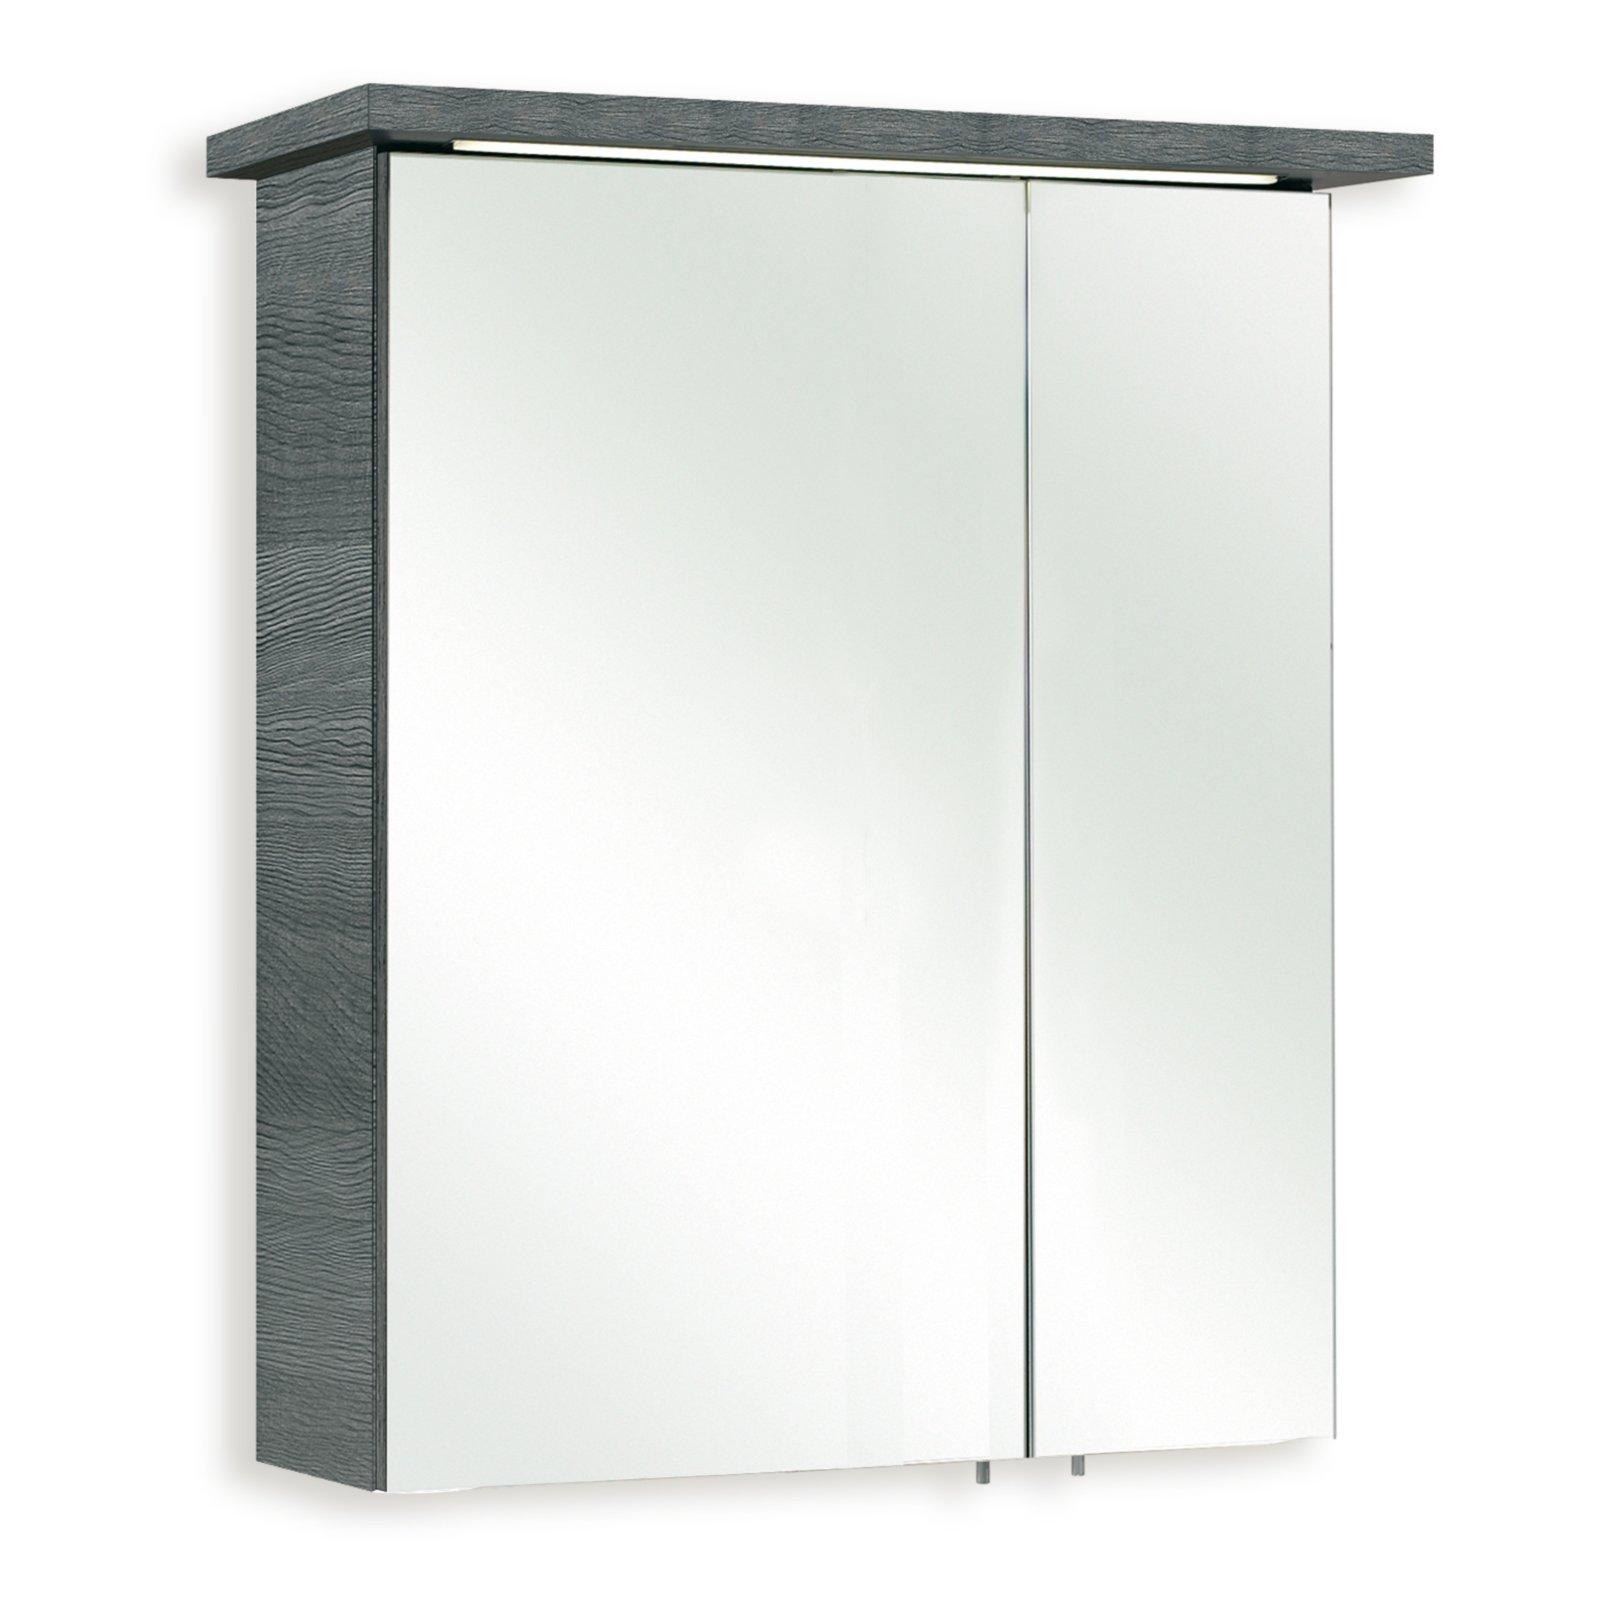 spiegelschrank cesa i graphit struktur 60 cm spiegelschr nke badm bel badezimmer. Black Bedroom Furniture Sets. Home Design Ideas